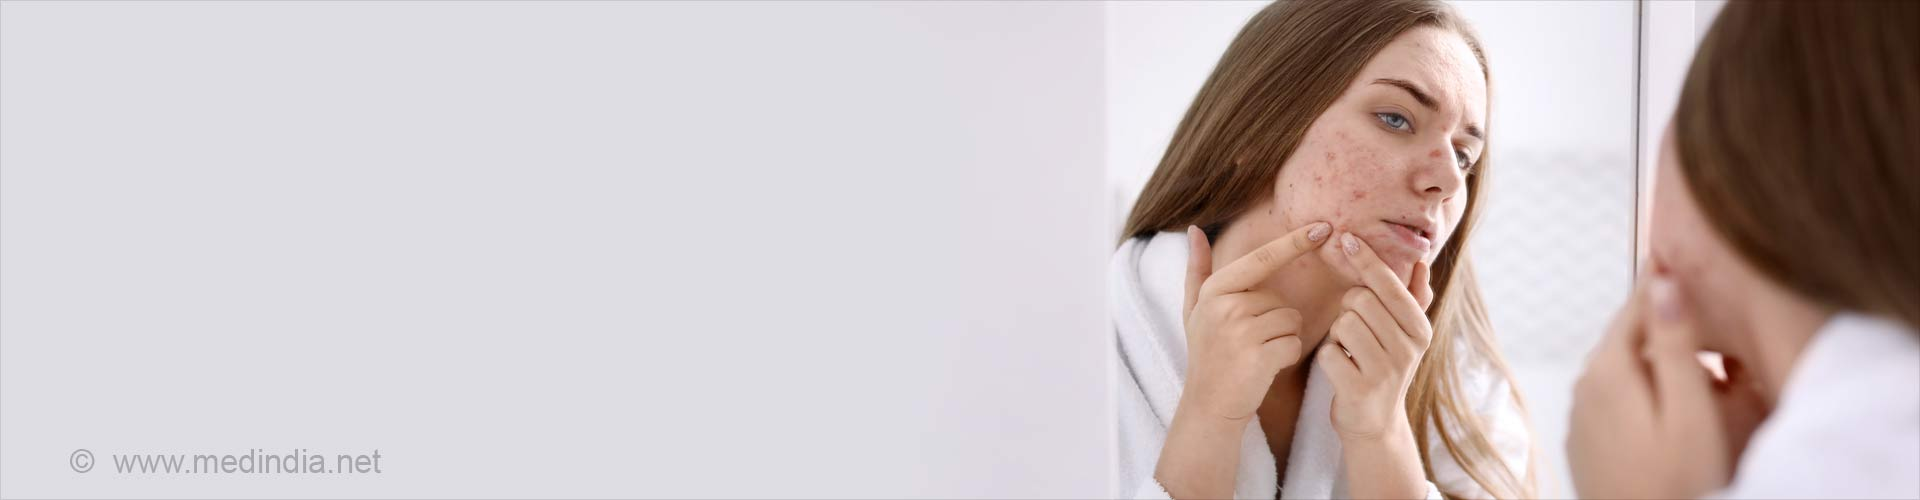 High Testosterone Level In Women / Hyperandrogenism